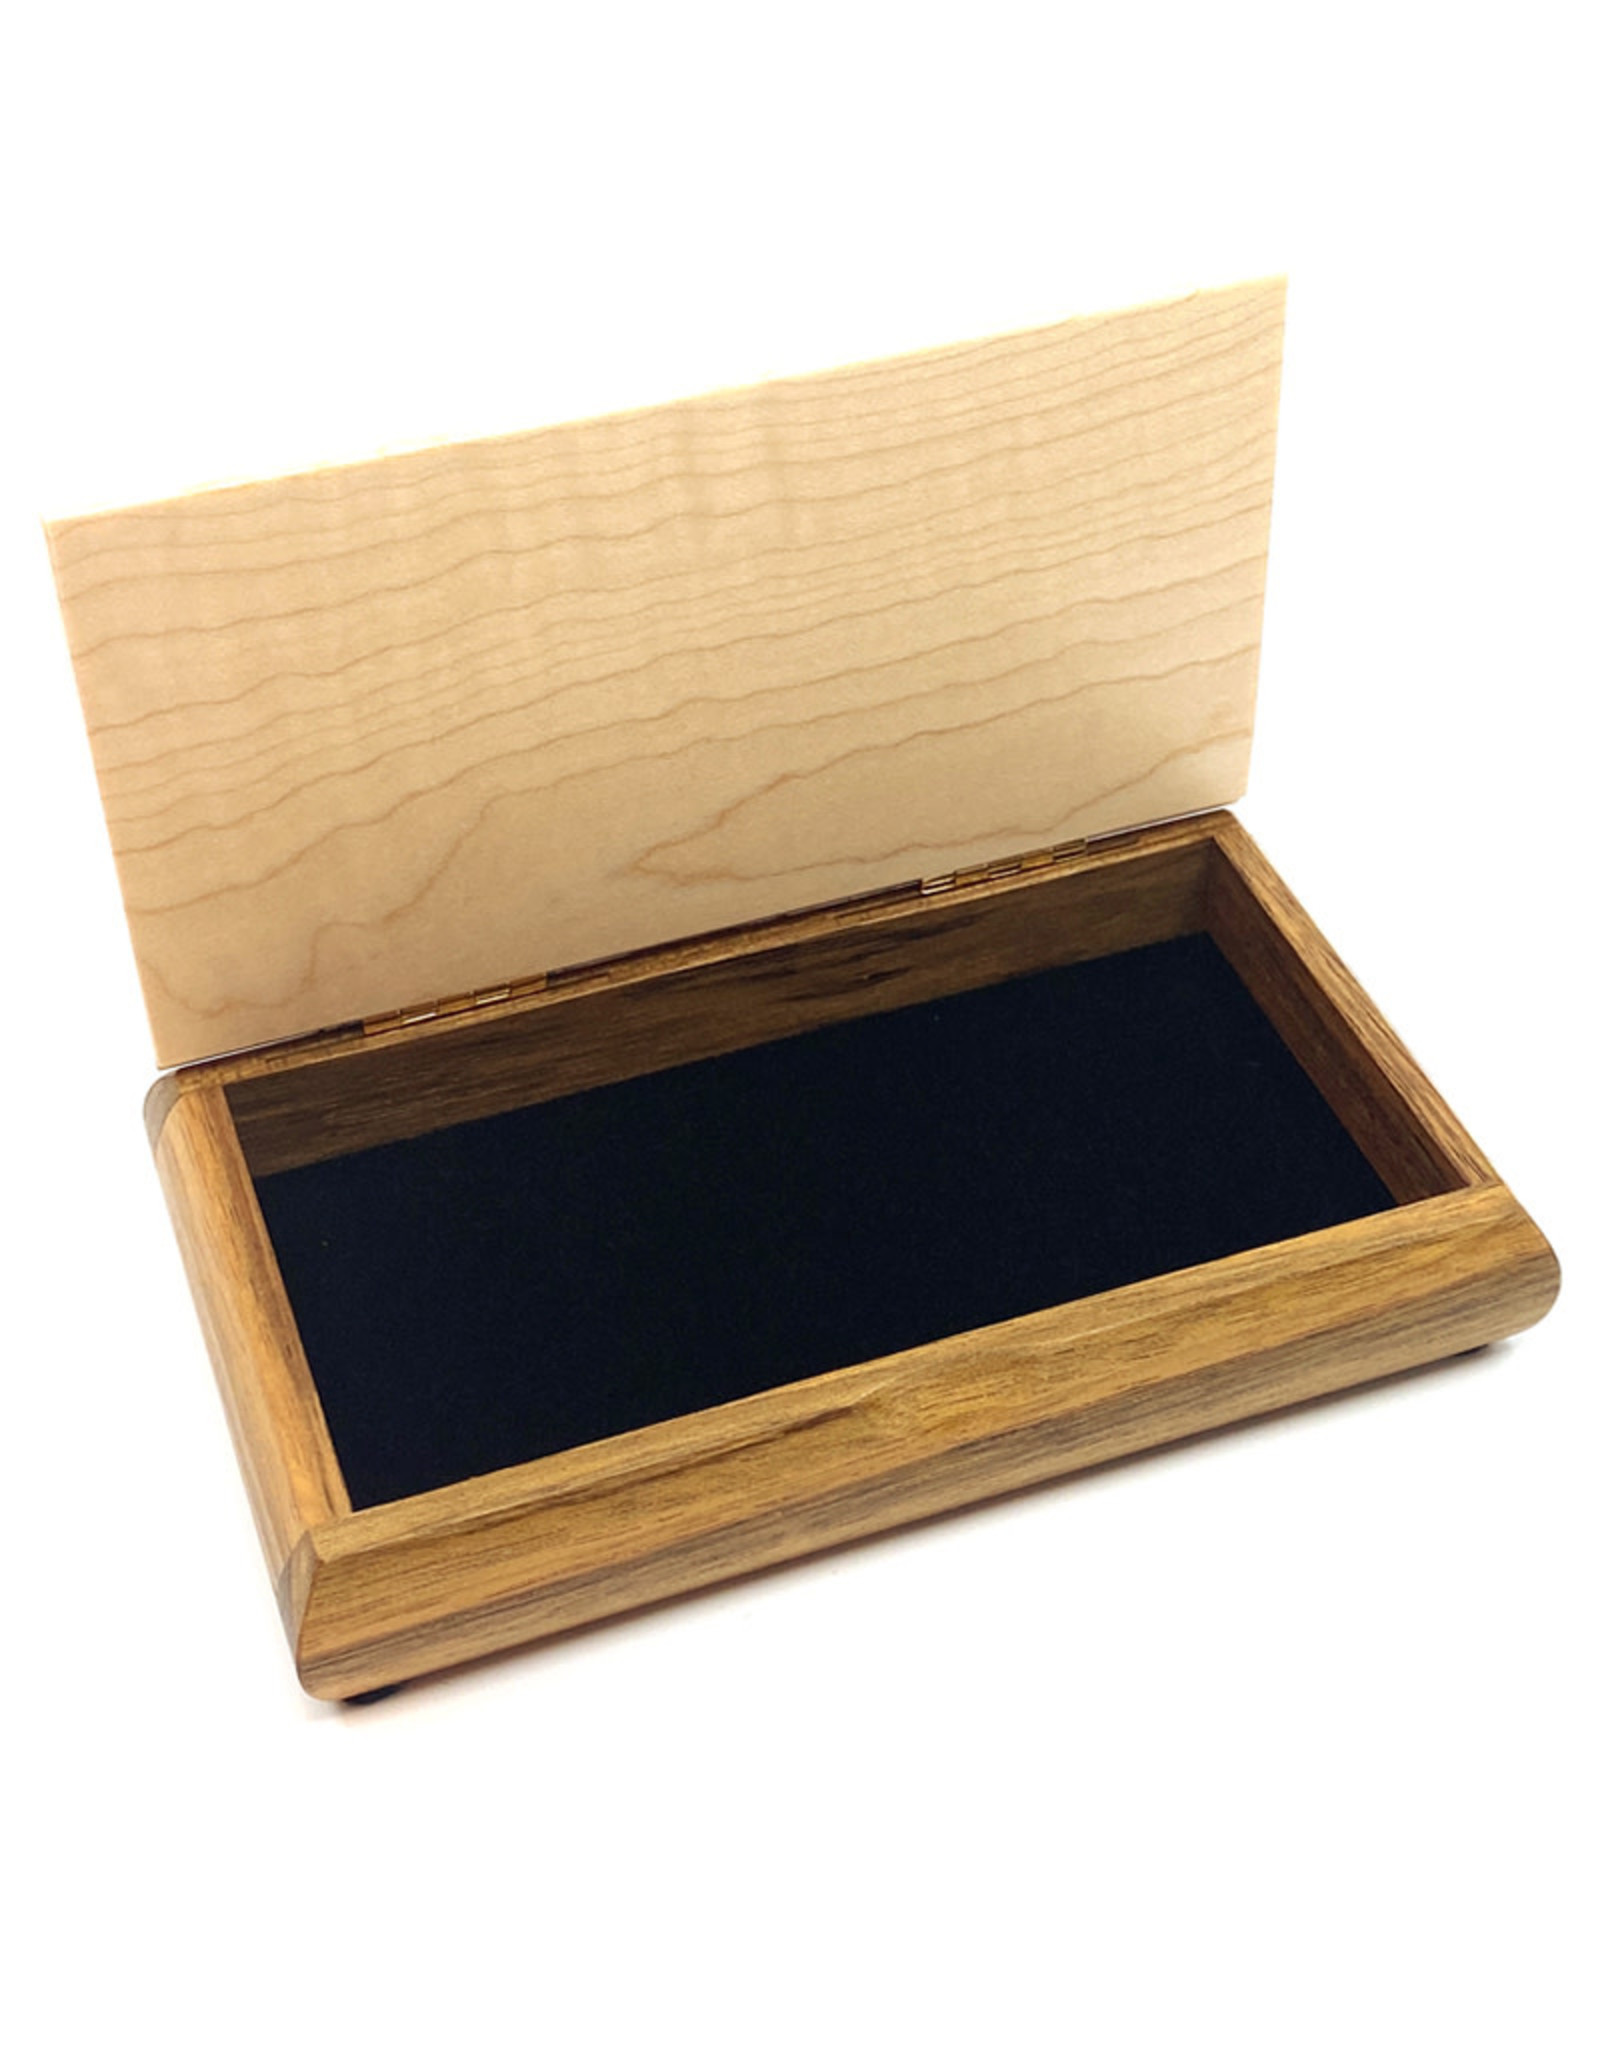 MIKUTOWSKI WOODWORKING ALWAYS POSSIBILITY BOX